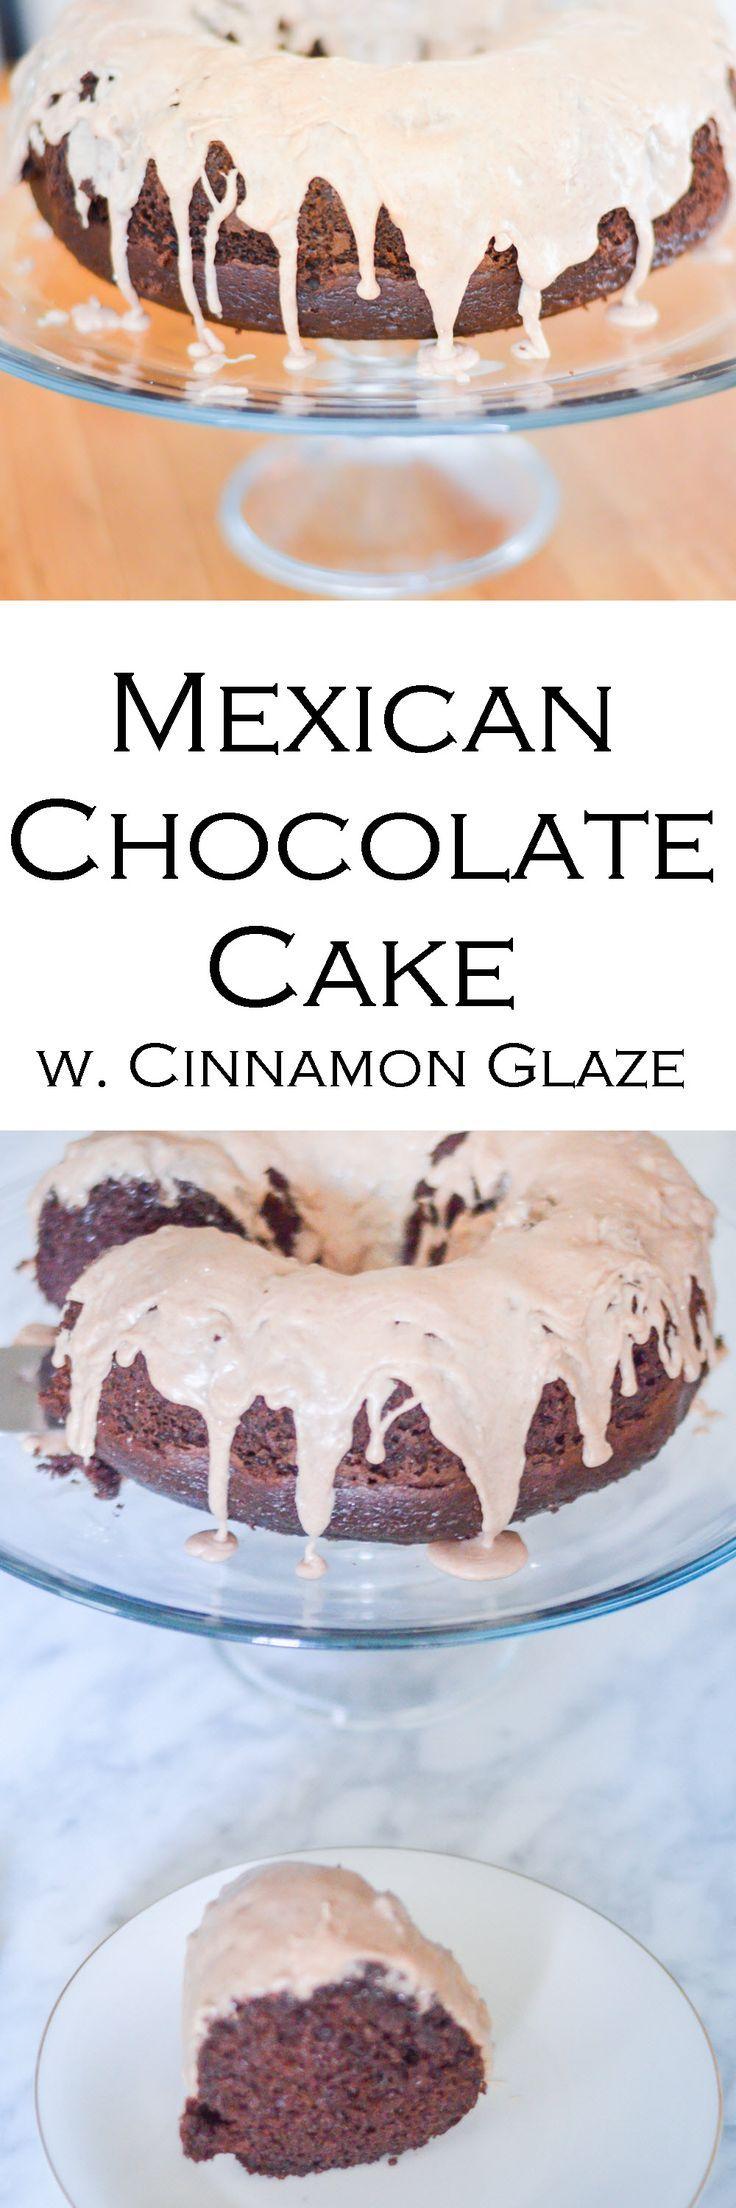 Mexican Chocolate Cake + Cinnamon Glaze